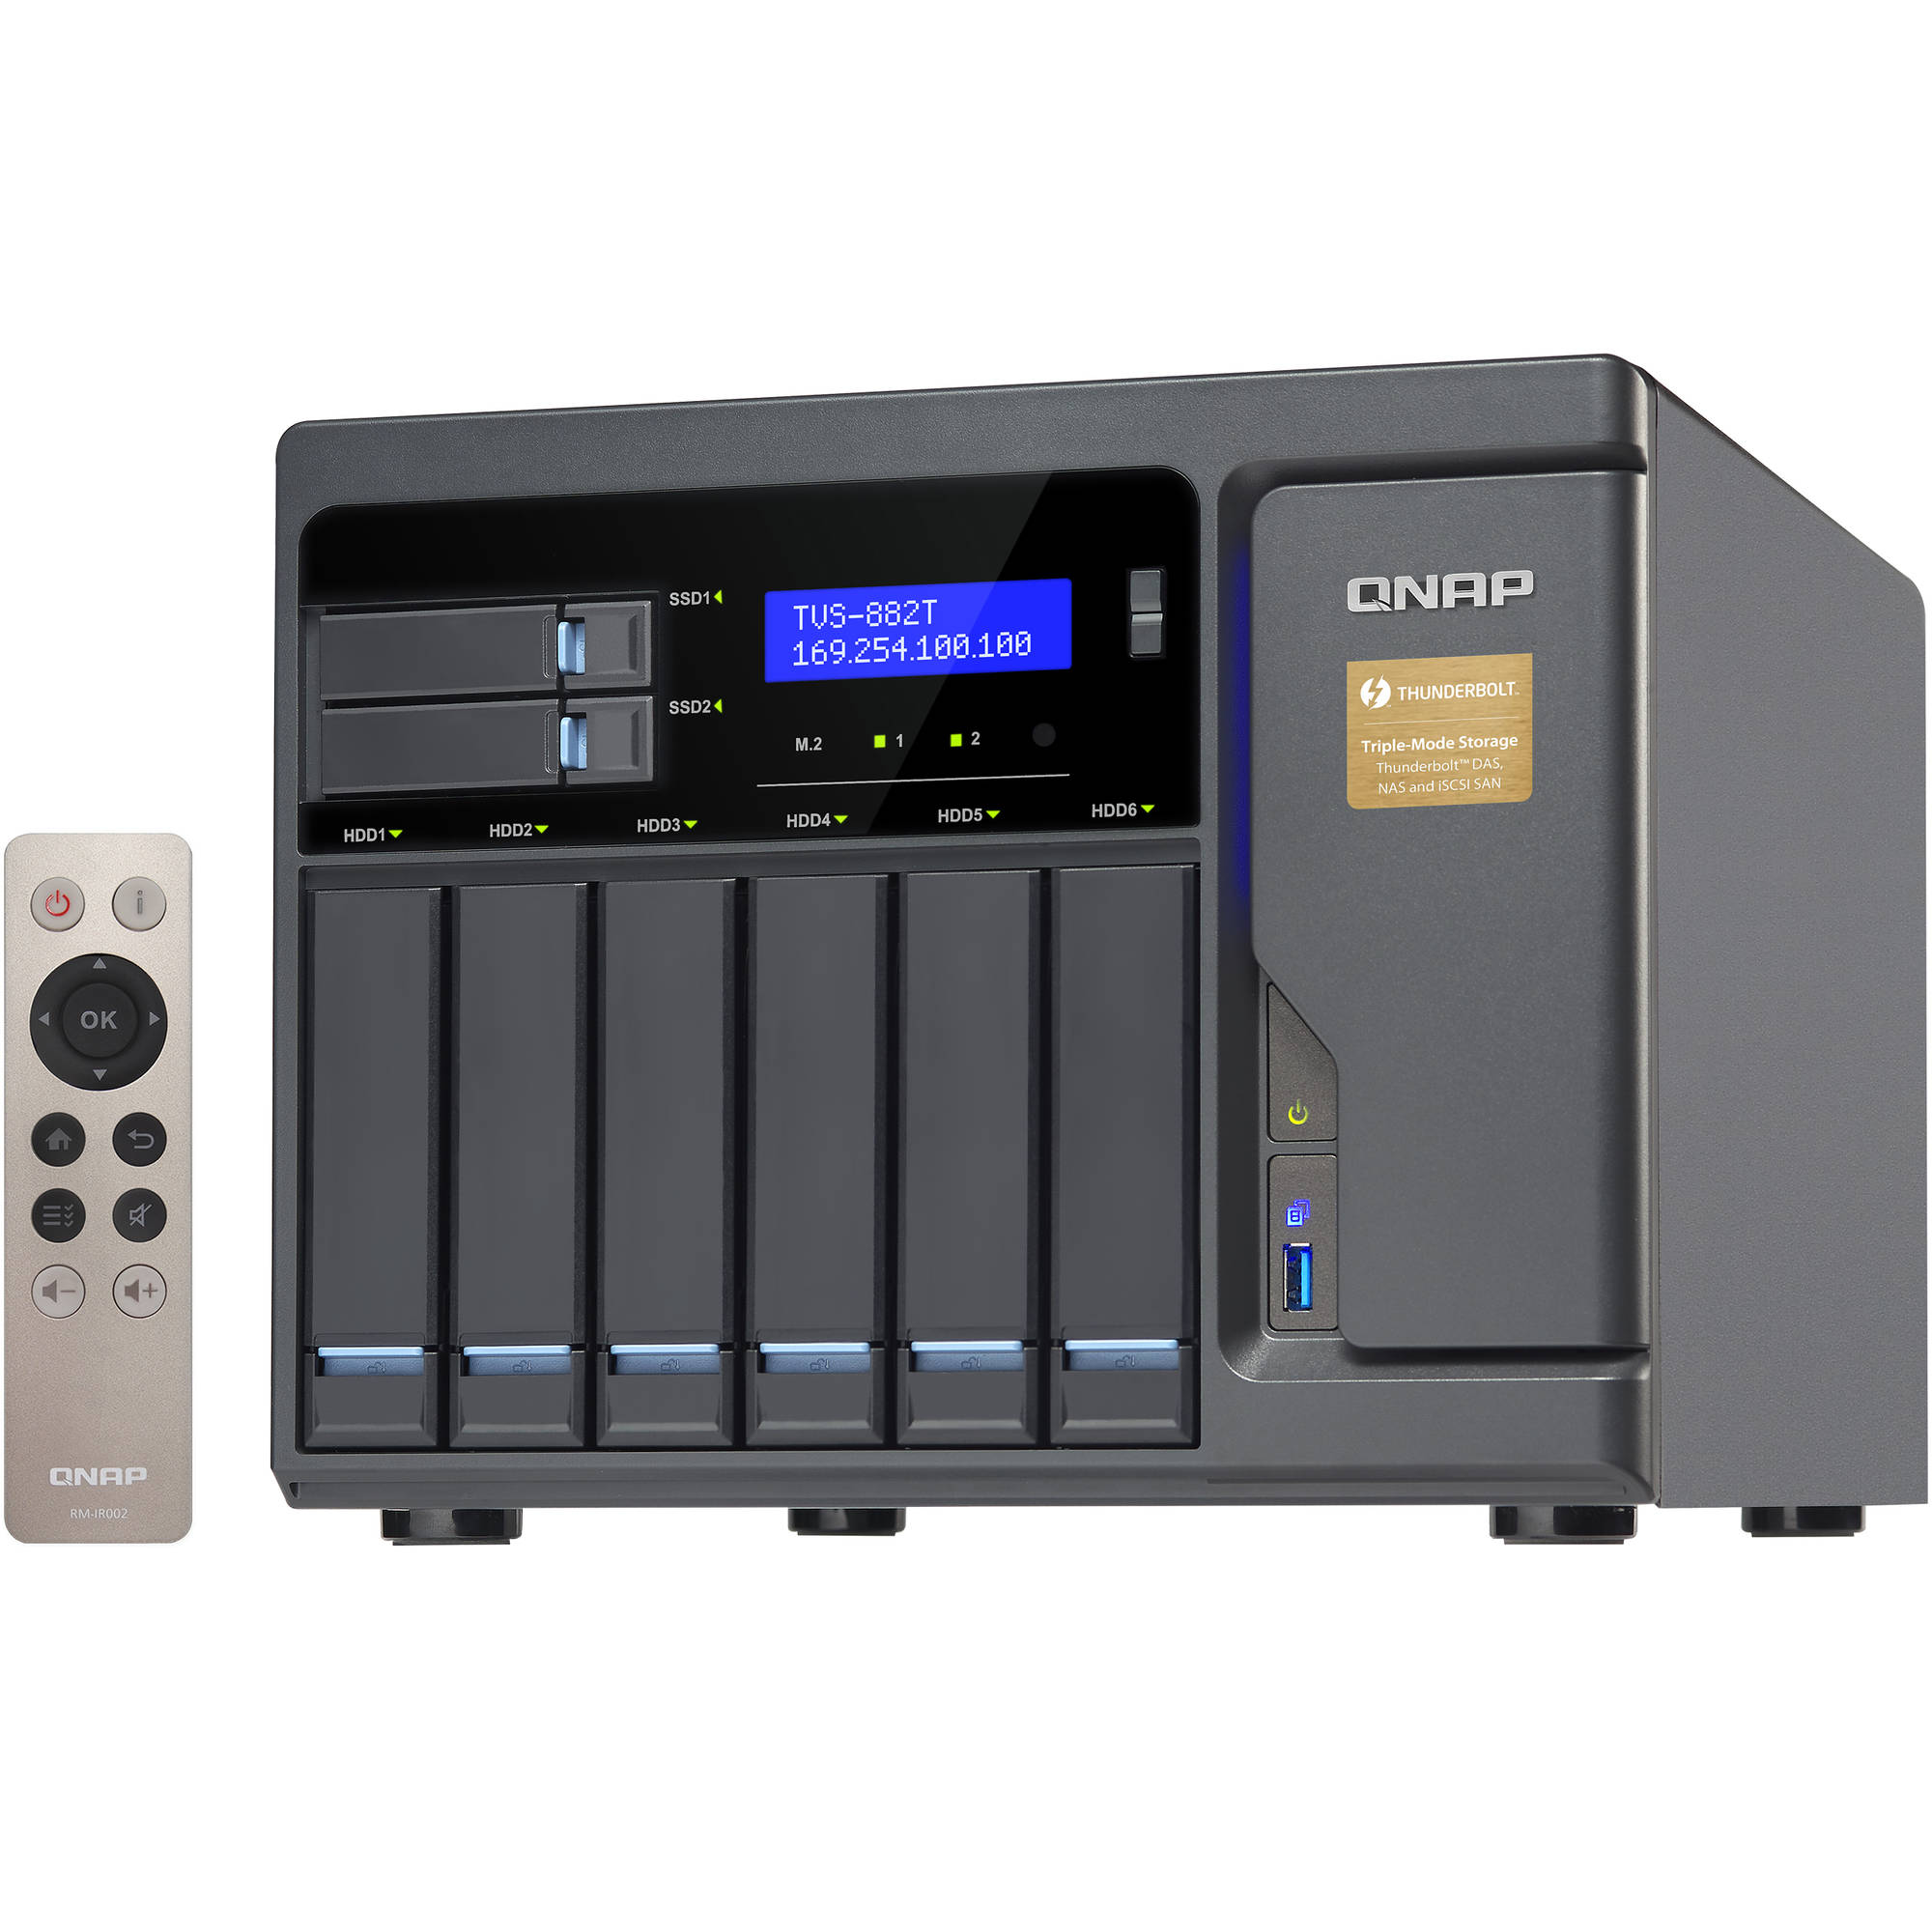 QNAP TVS-882T 8-Bay NAS Enclosure